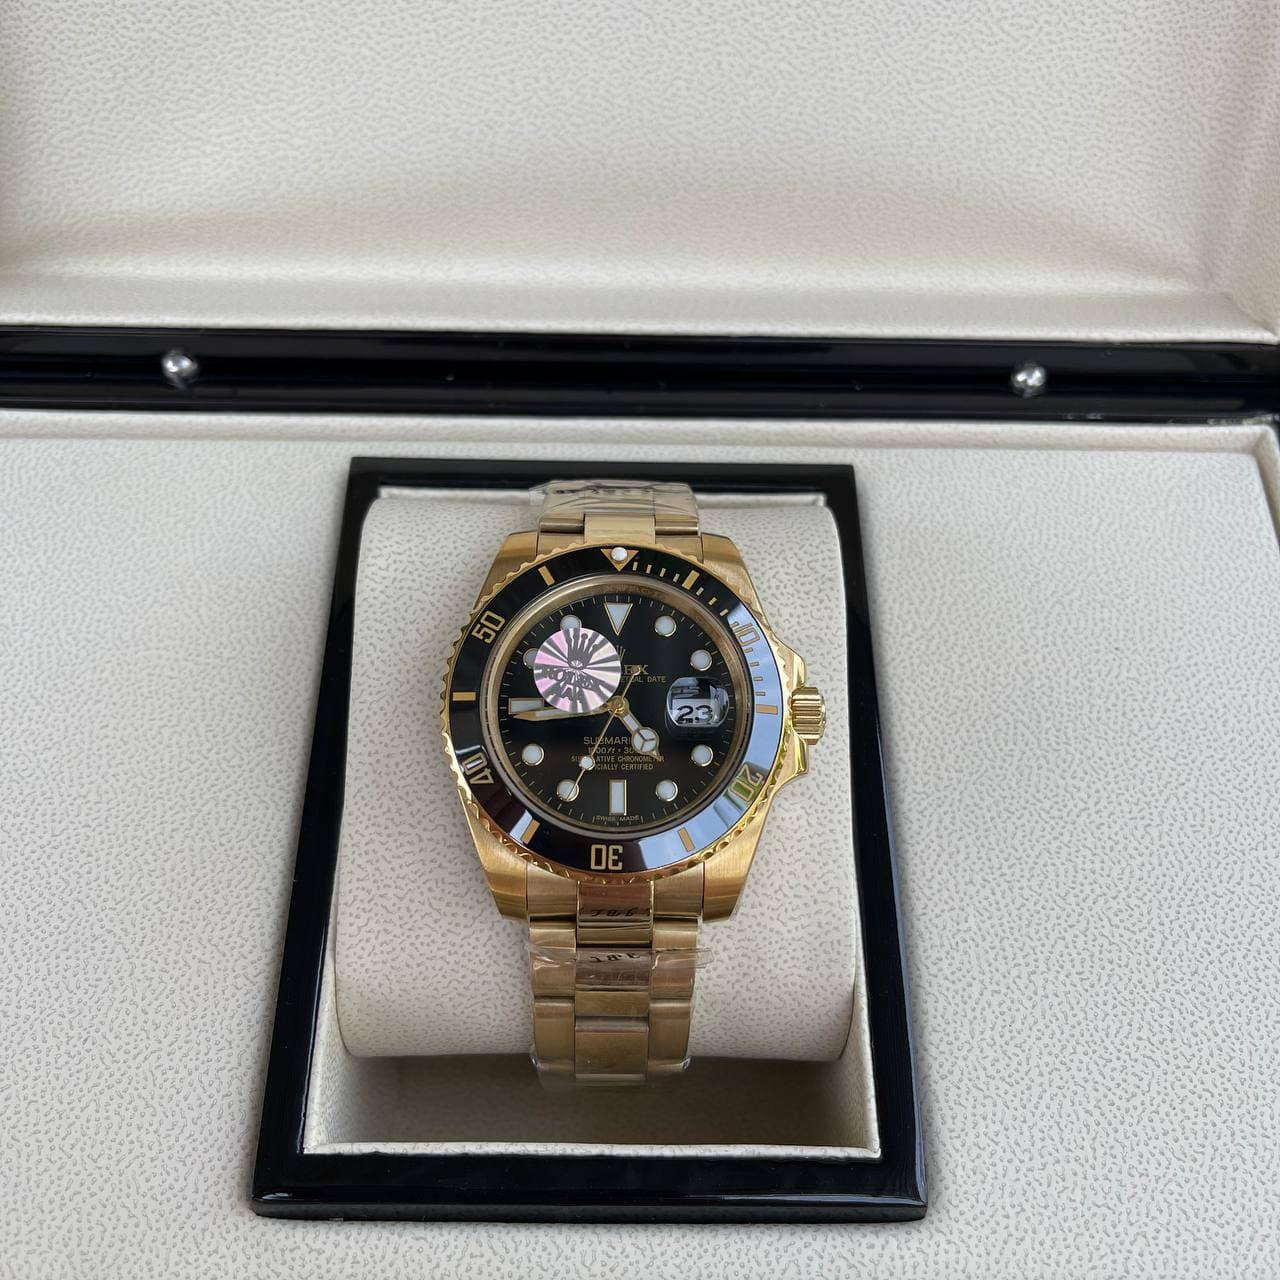 Часы Rolex Submariner AAA Date Gold-Black премиального ААА класса